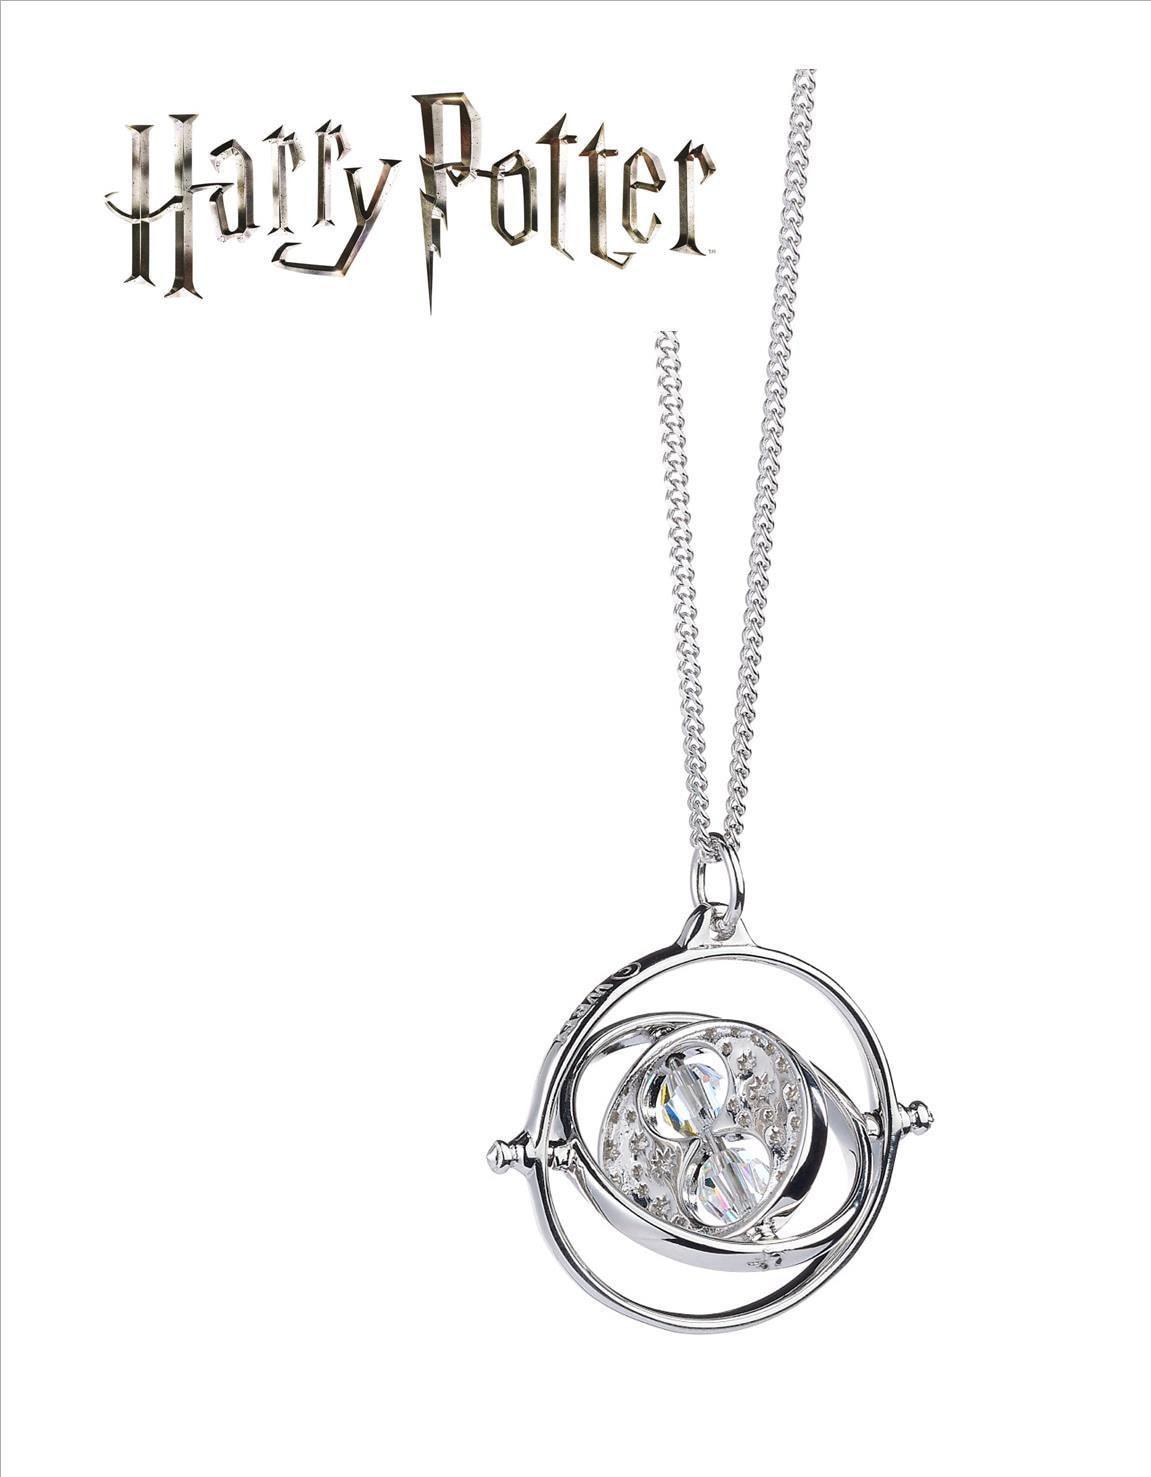 Official Harry Potter Time Turner Necklace with Swarovski® Crystal Elements